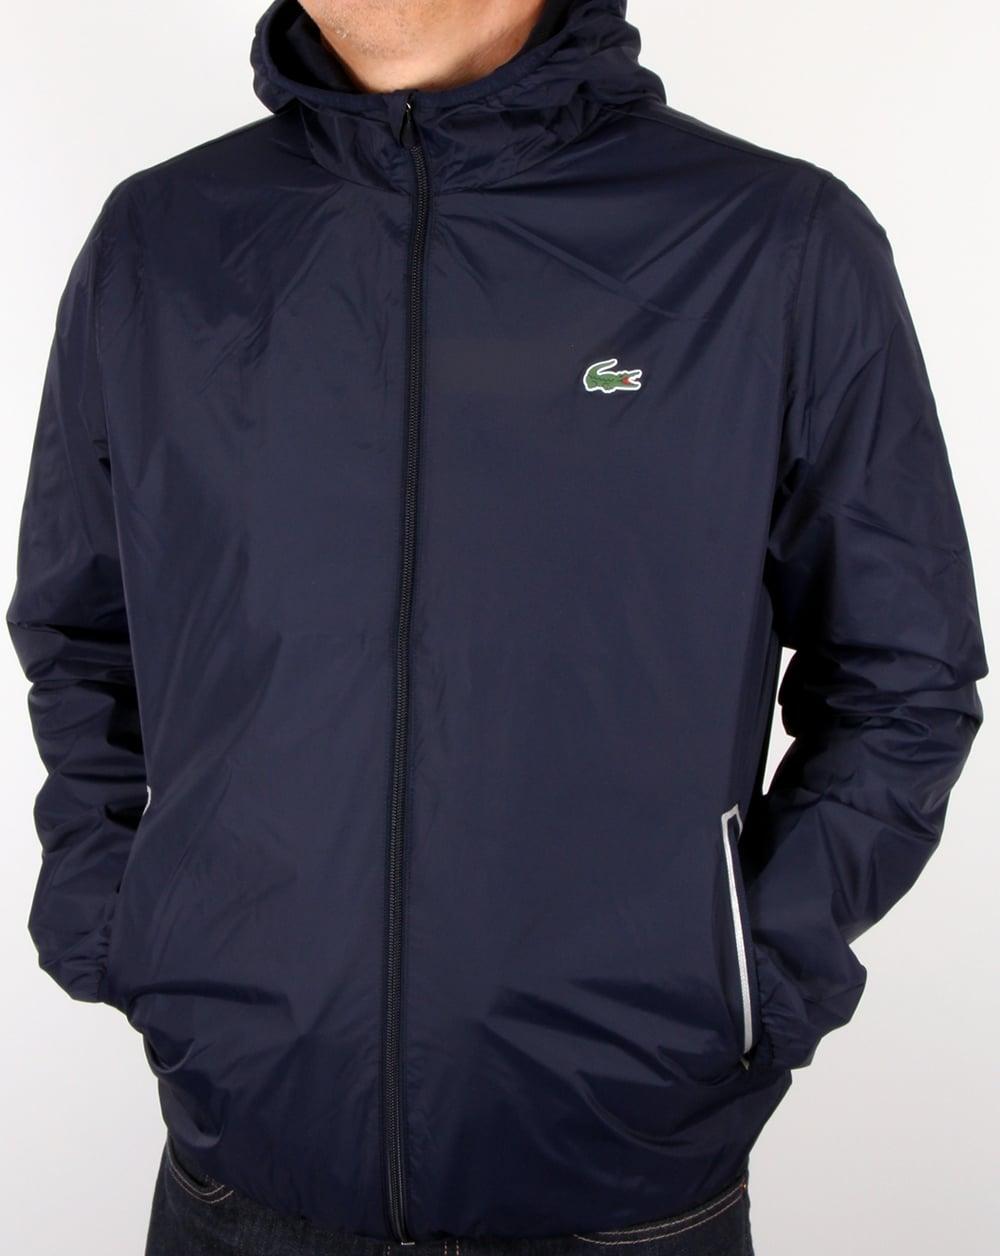 lacoste sport taffeta hooded jacket navy men 39 s. Black Bedroom Furniture Sets. Home Design Ideas